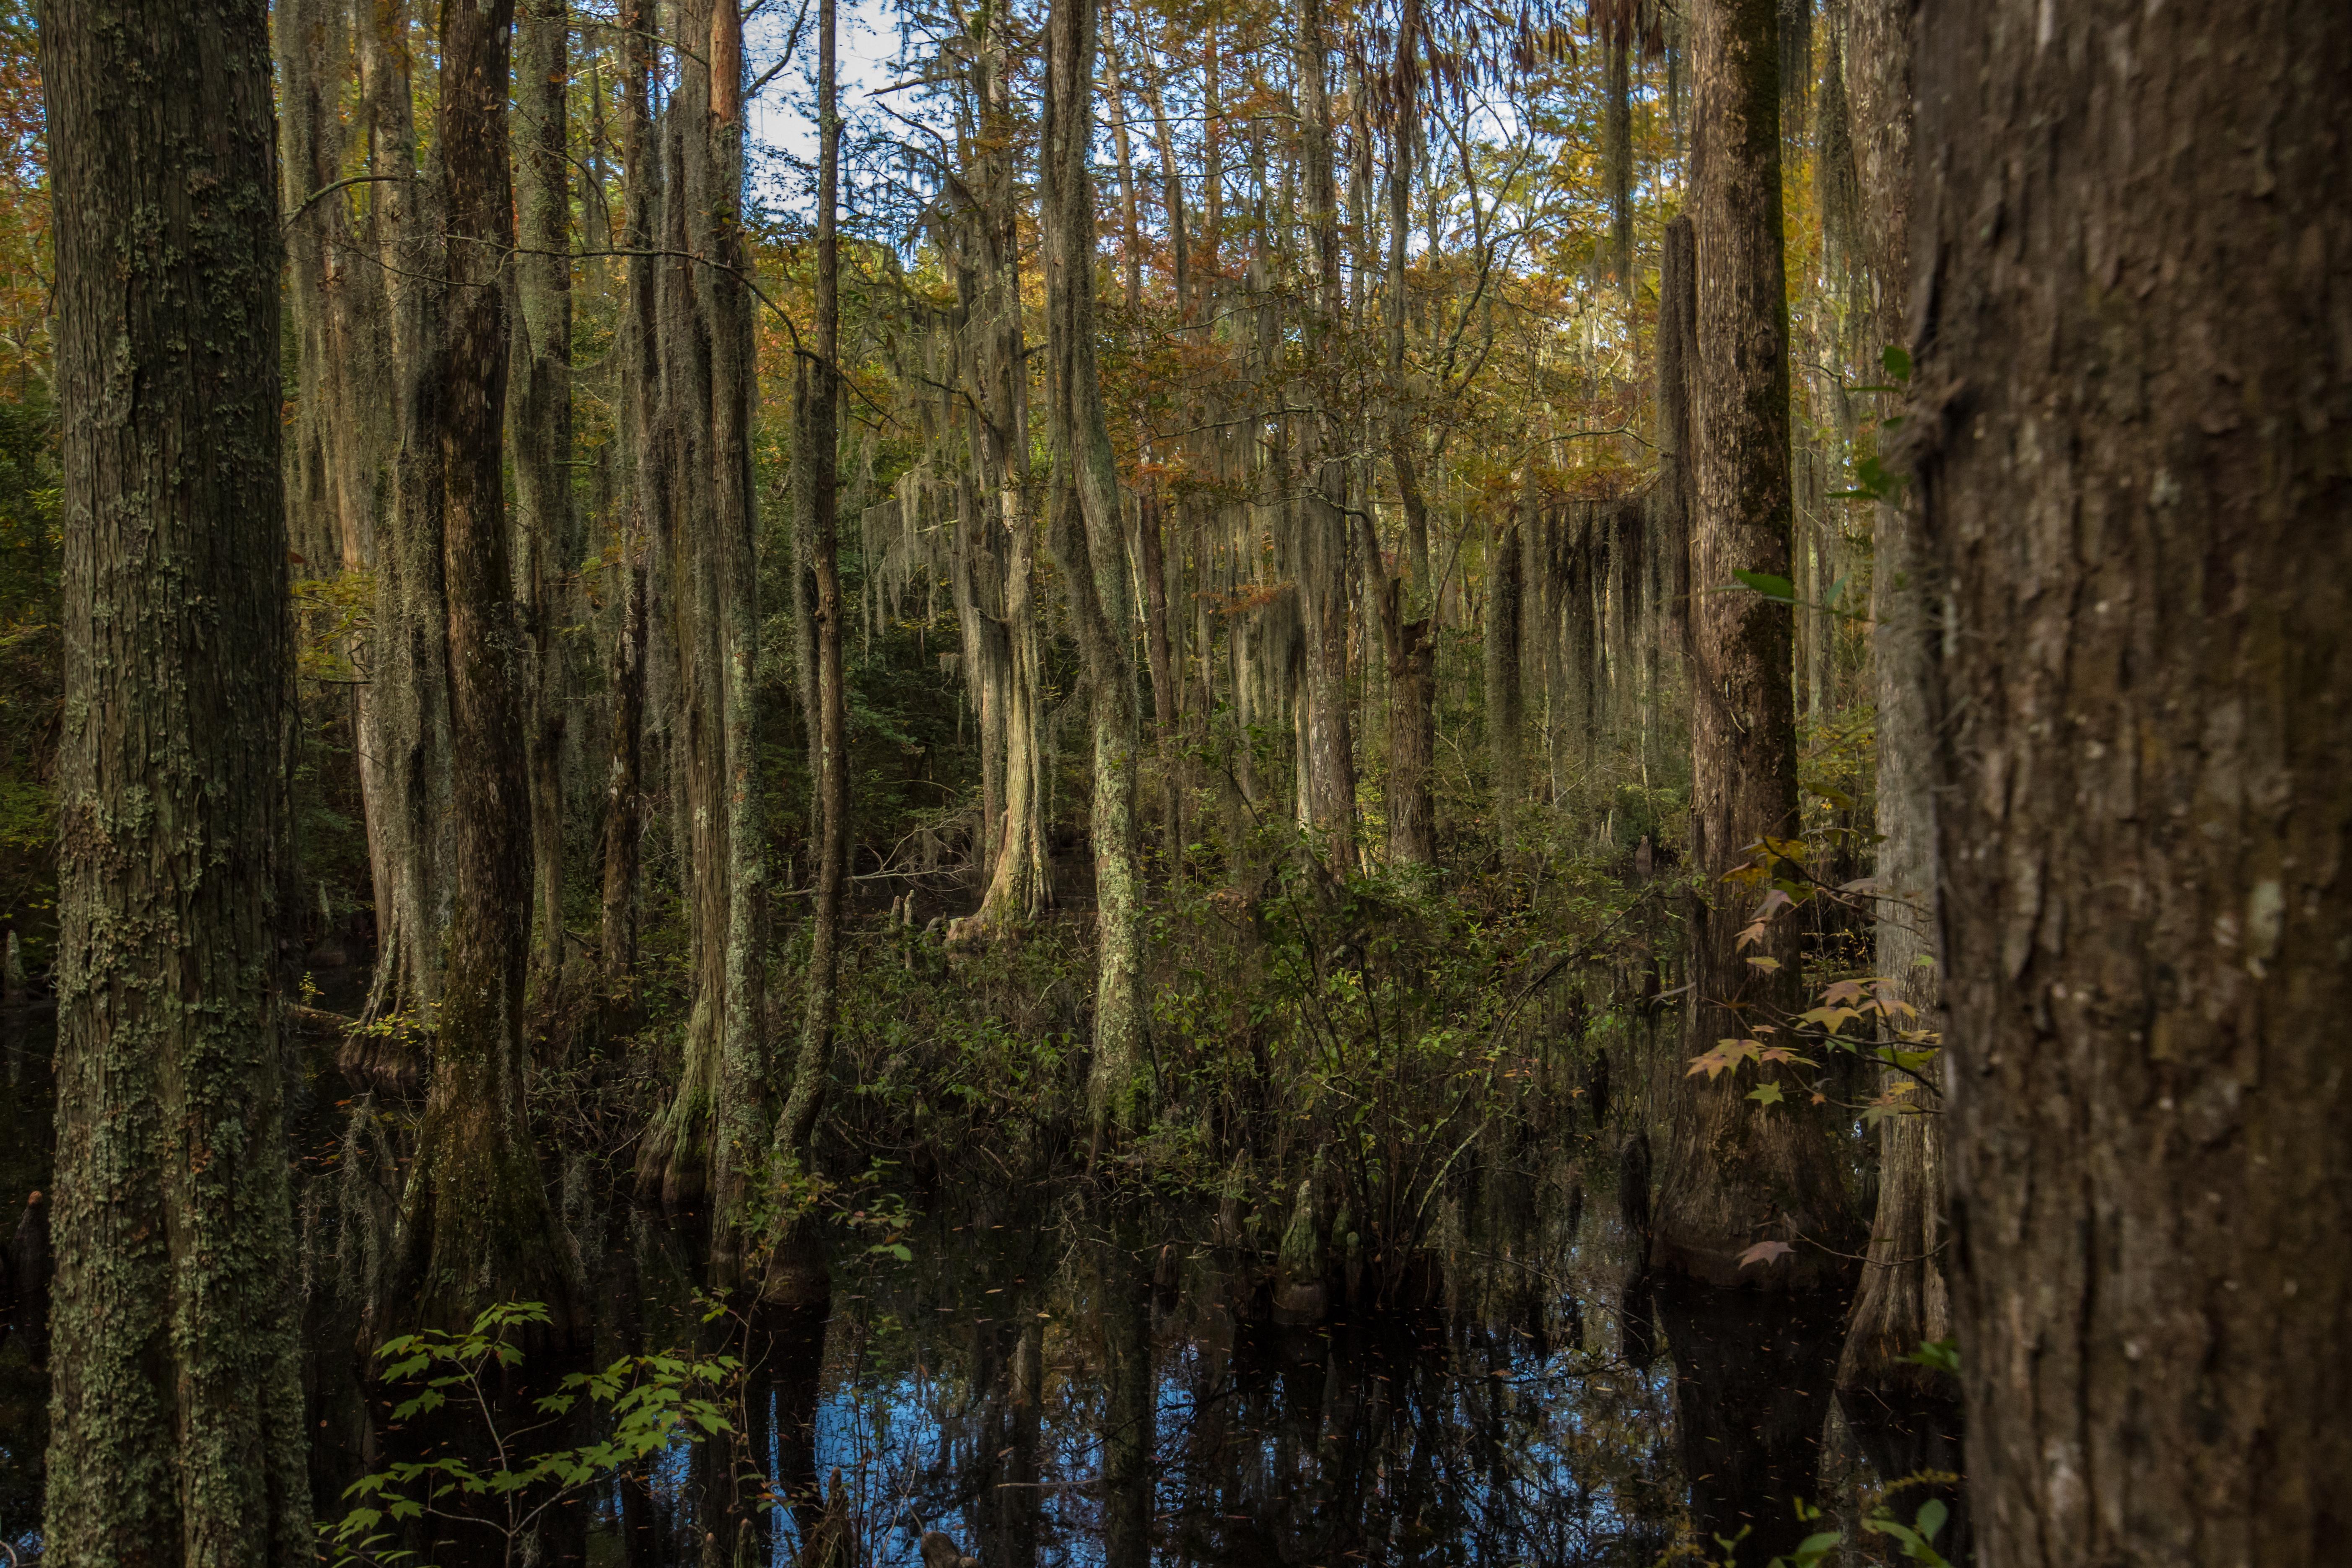 Virginia Beach's First Landing State Park Cypress Swamp